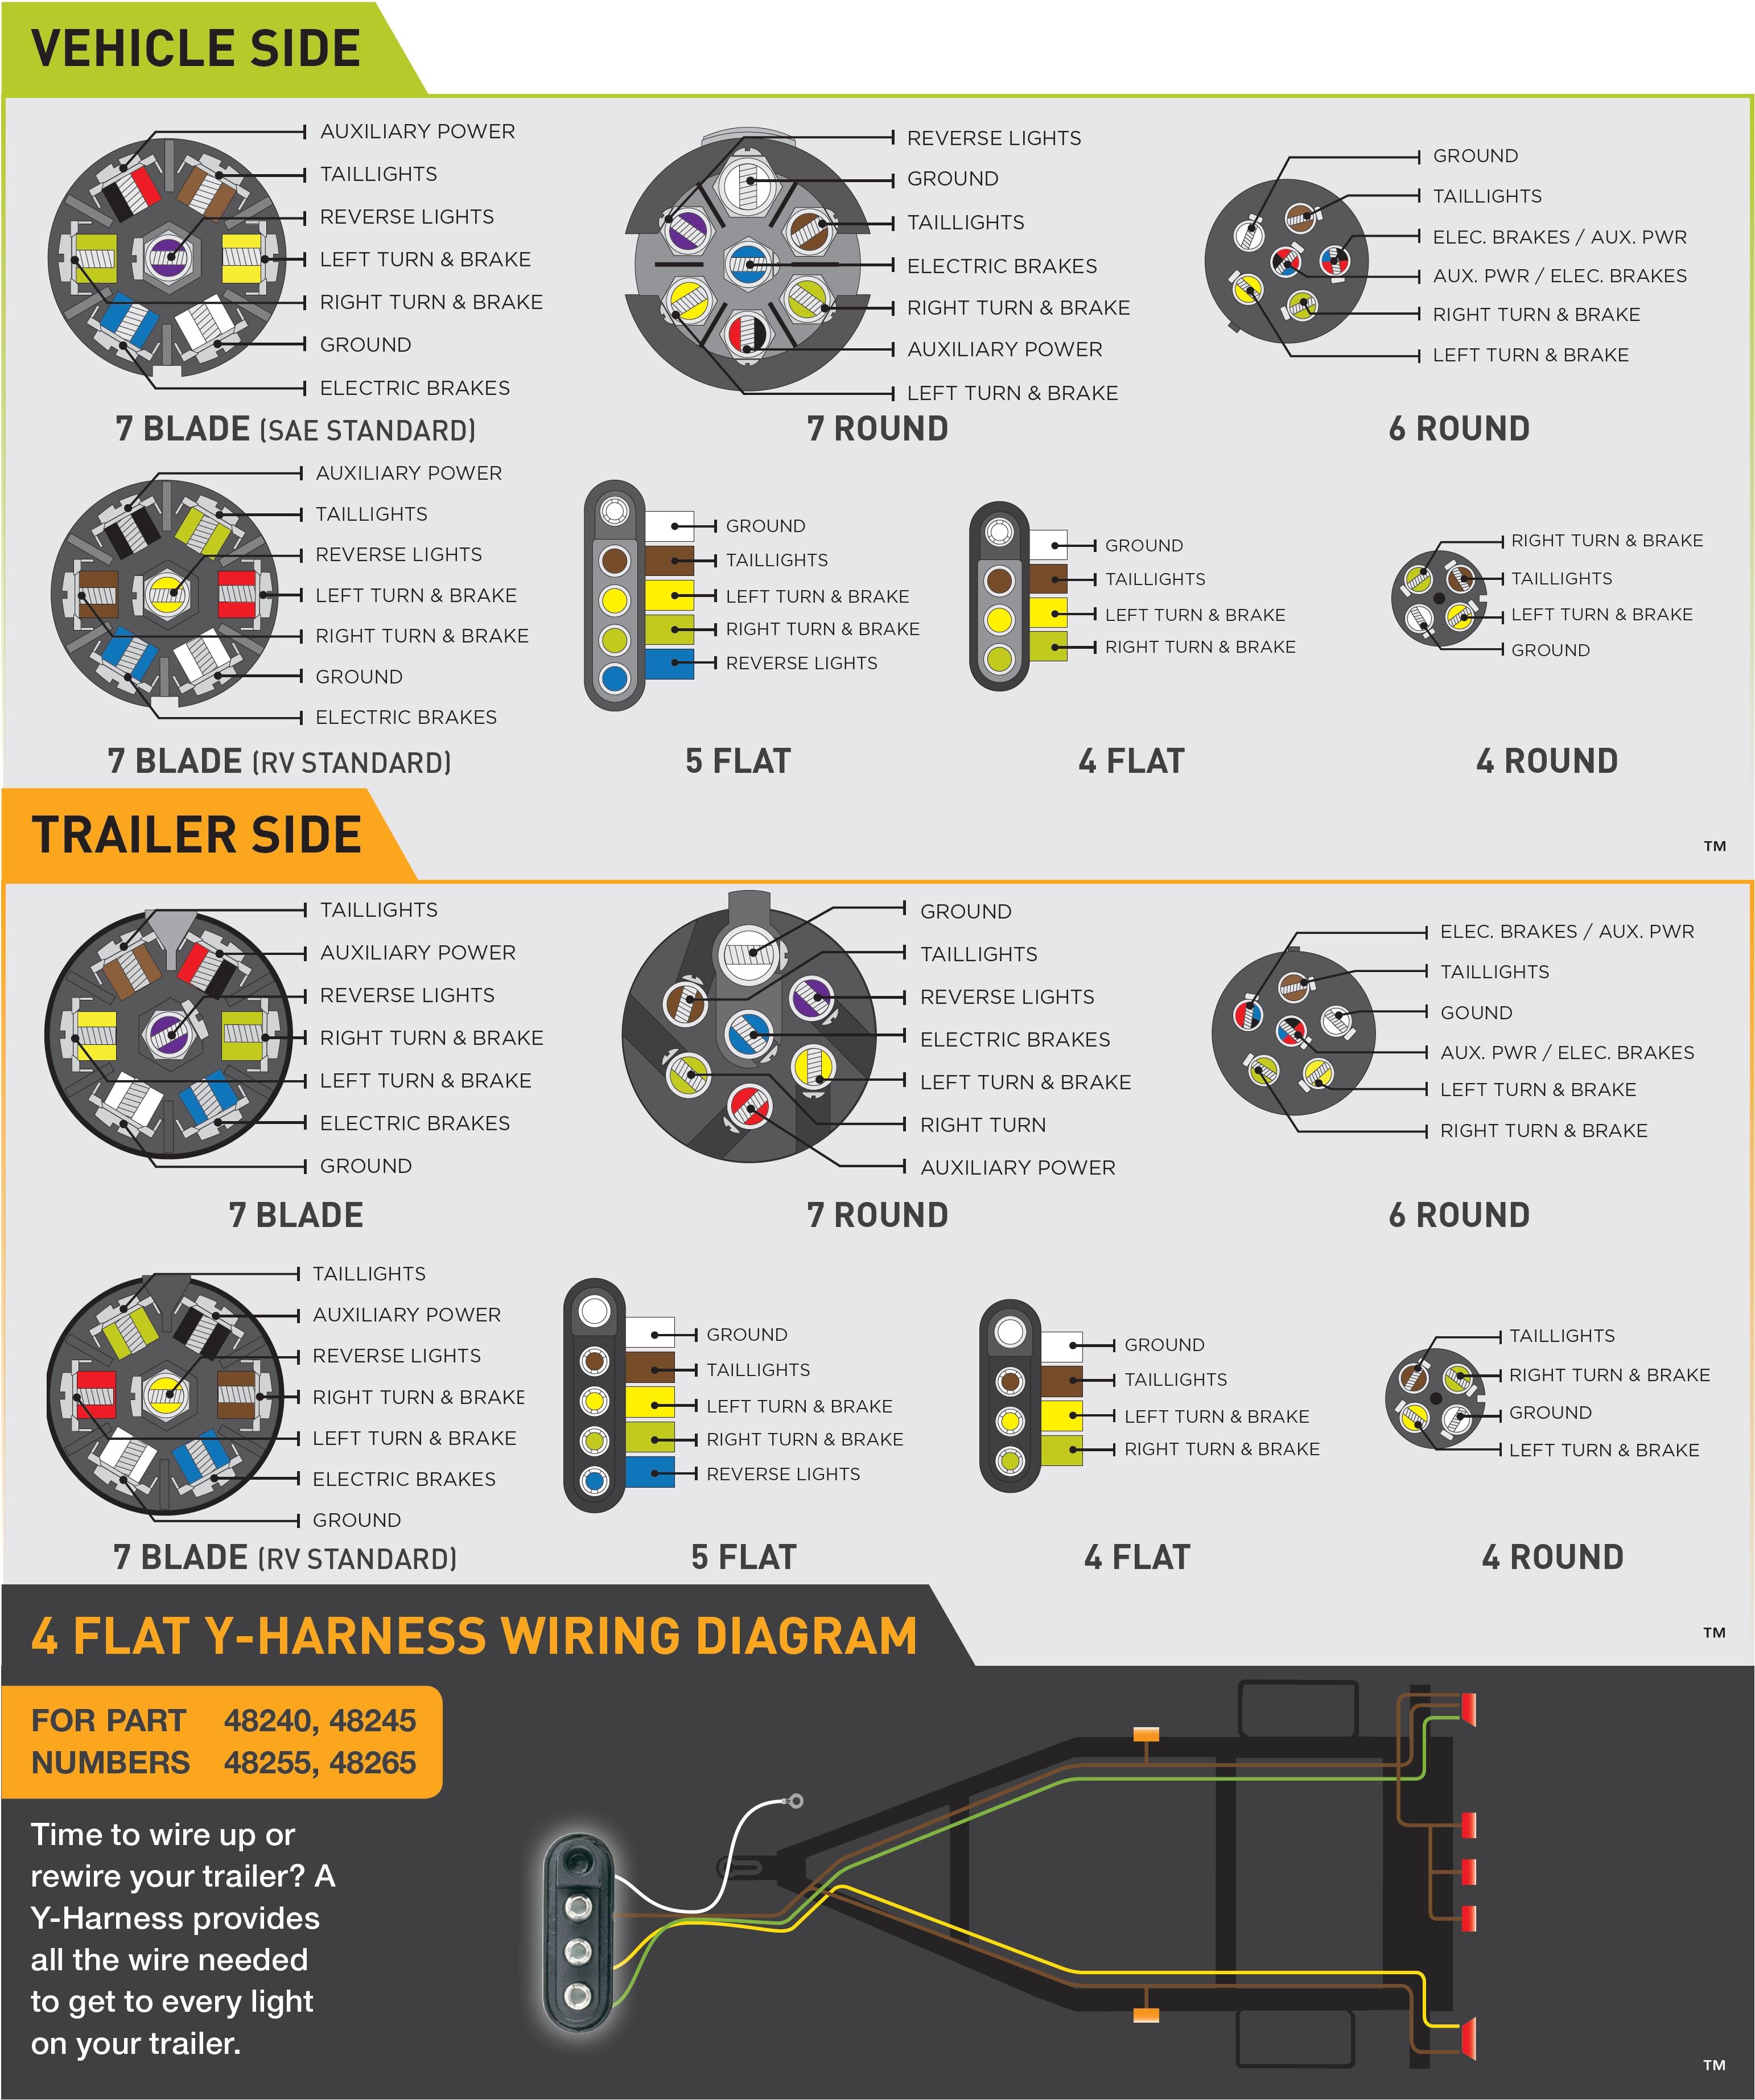 Wiring Guides - Seven Pin Wiring Diagram